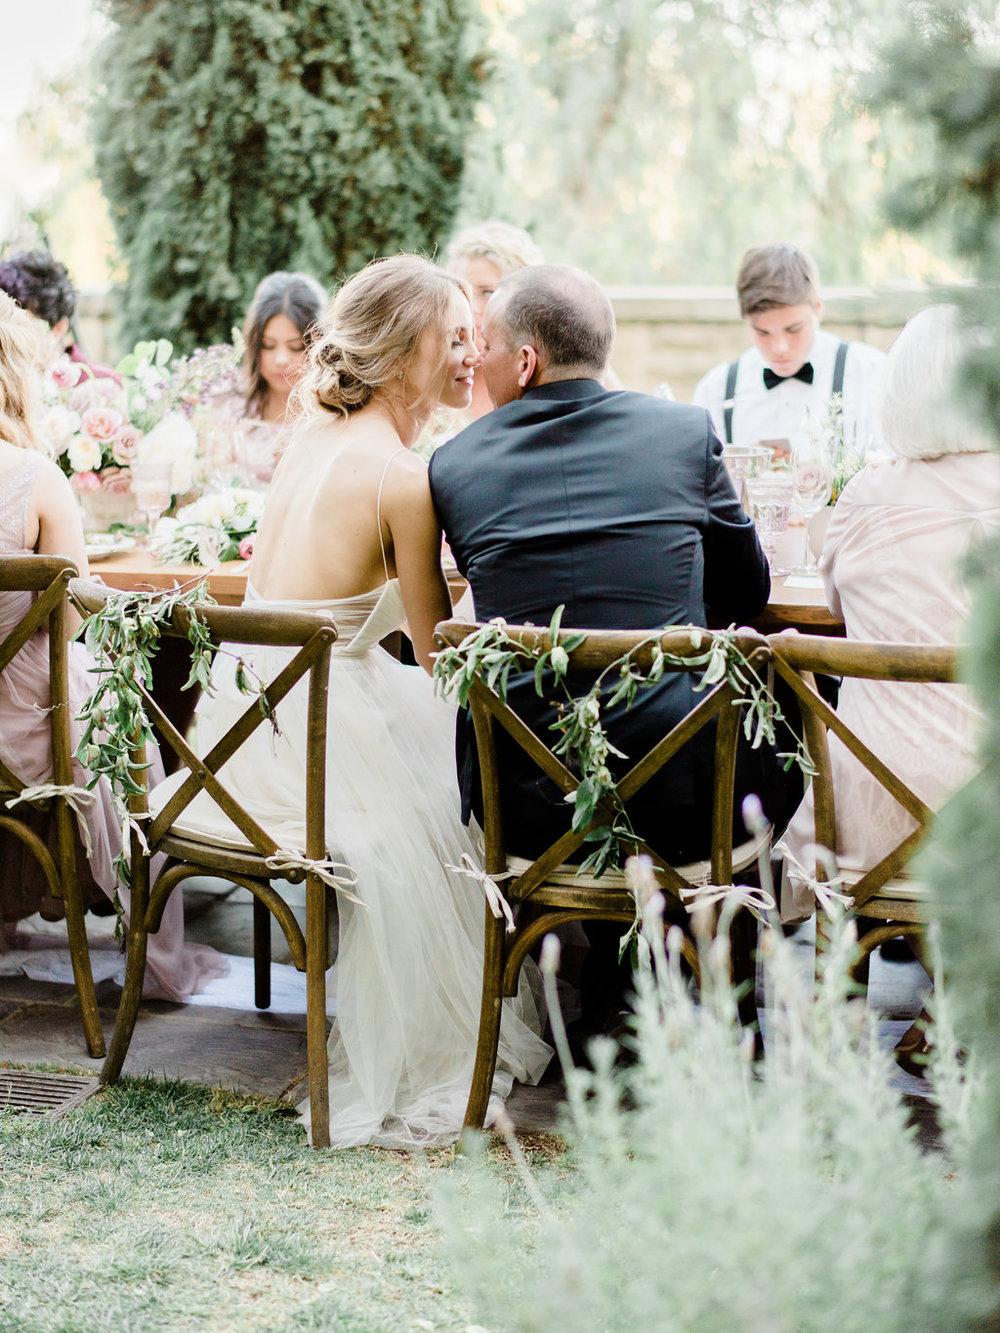 linajaandmichael-wedding-996.jpg